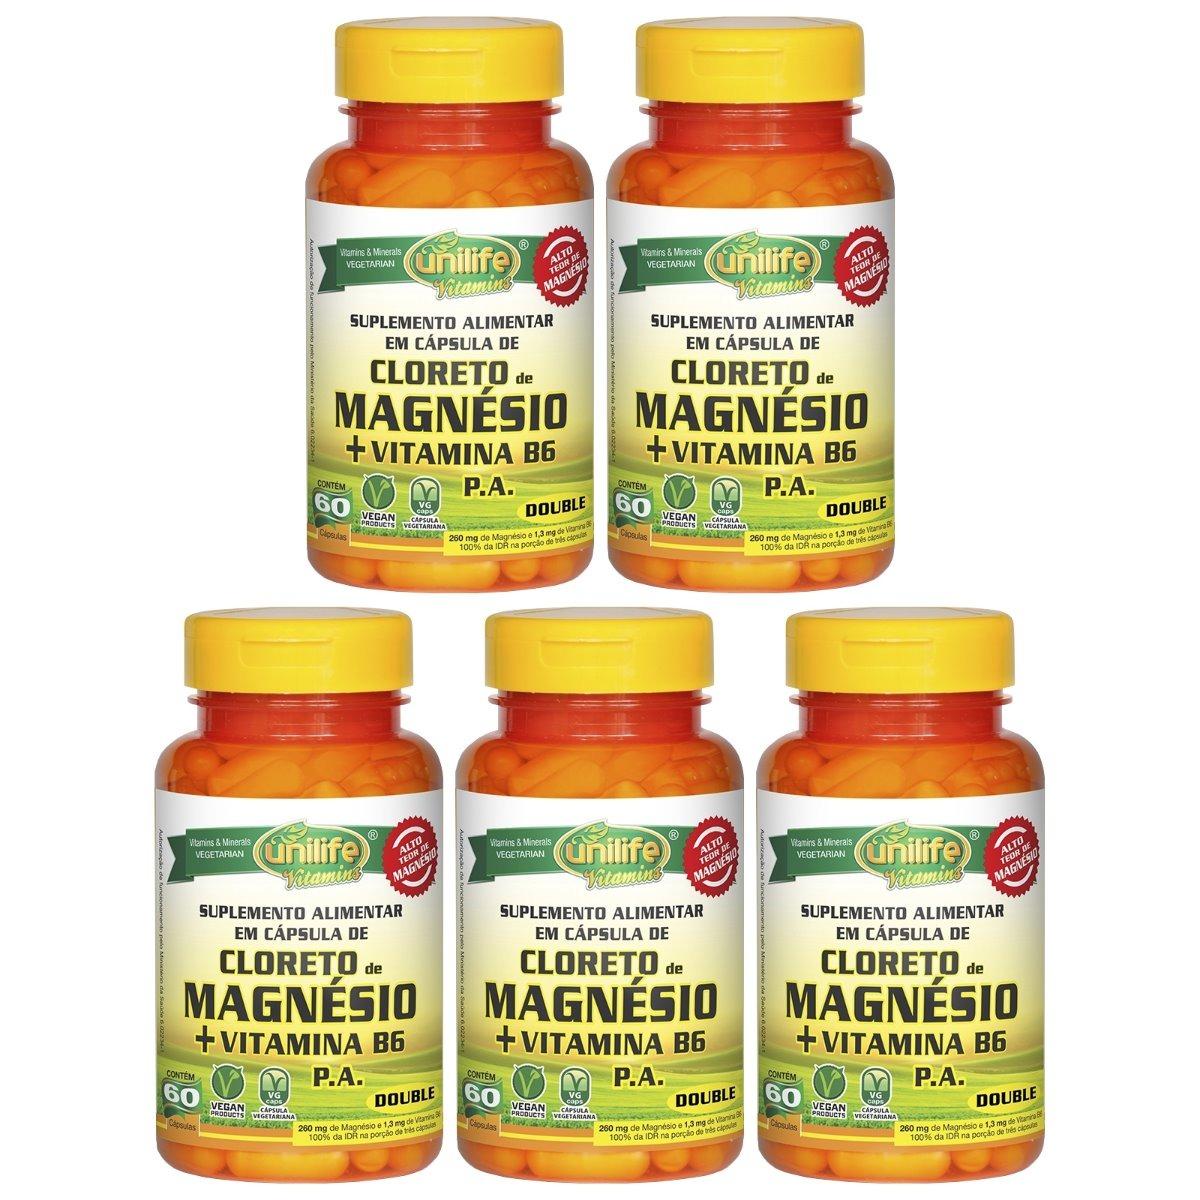 Cloreto De Magnésio P.A. + Vitamina B6 - 60 Cápsulas 800mg Unilife Kit 5 Unidades